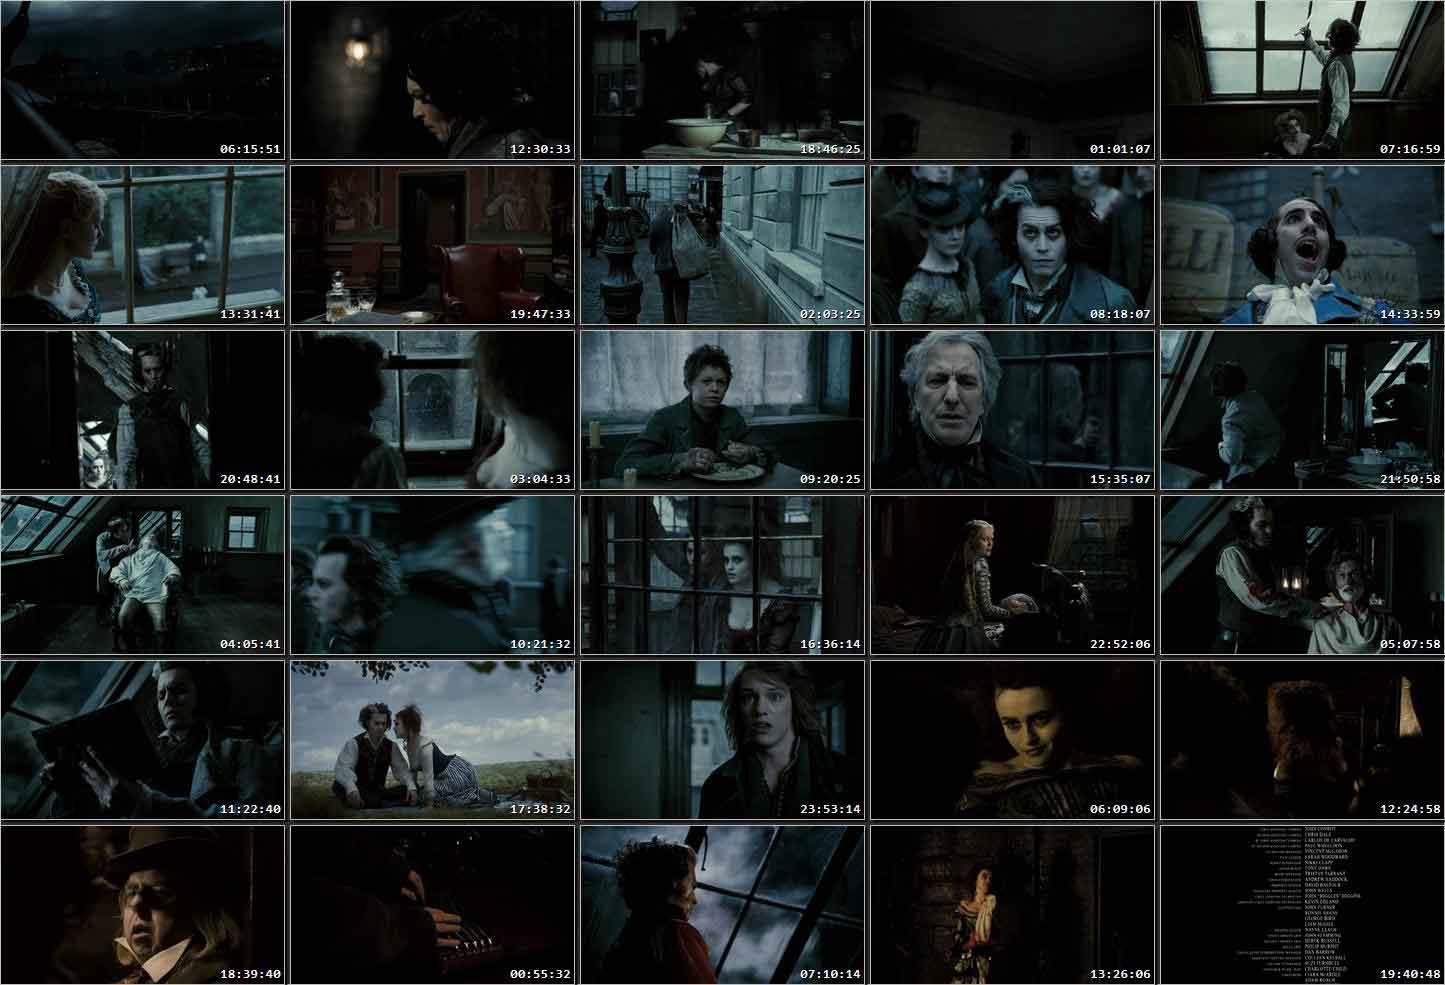 sweeney todd full movie download 720p